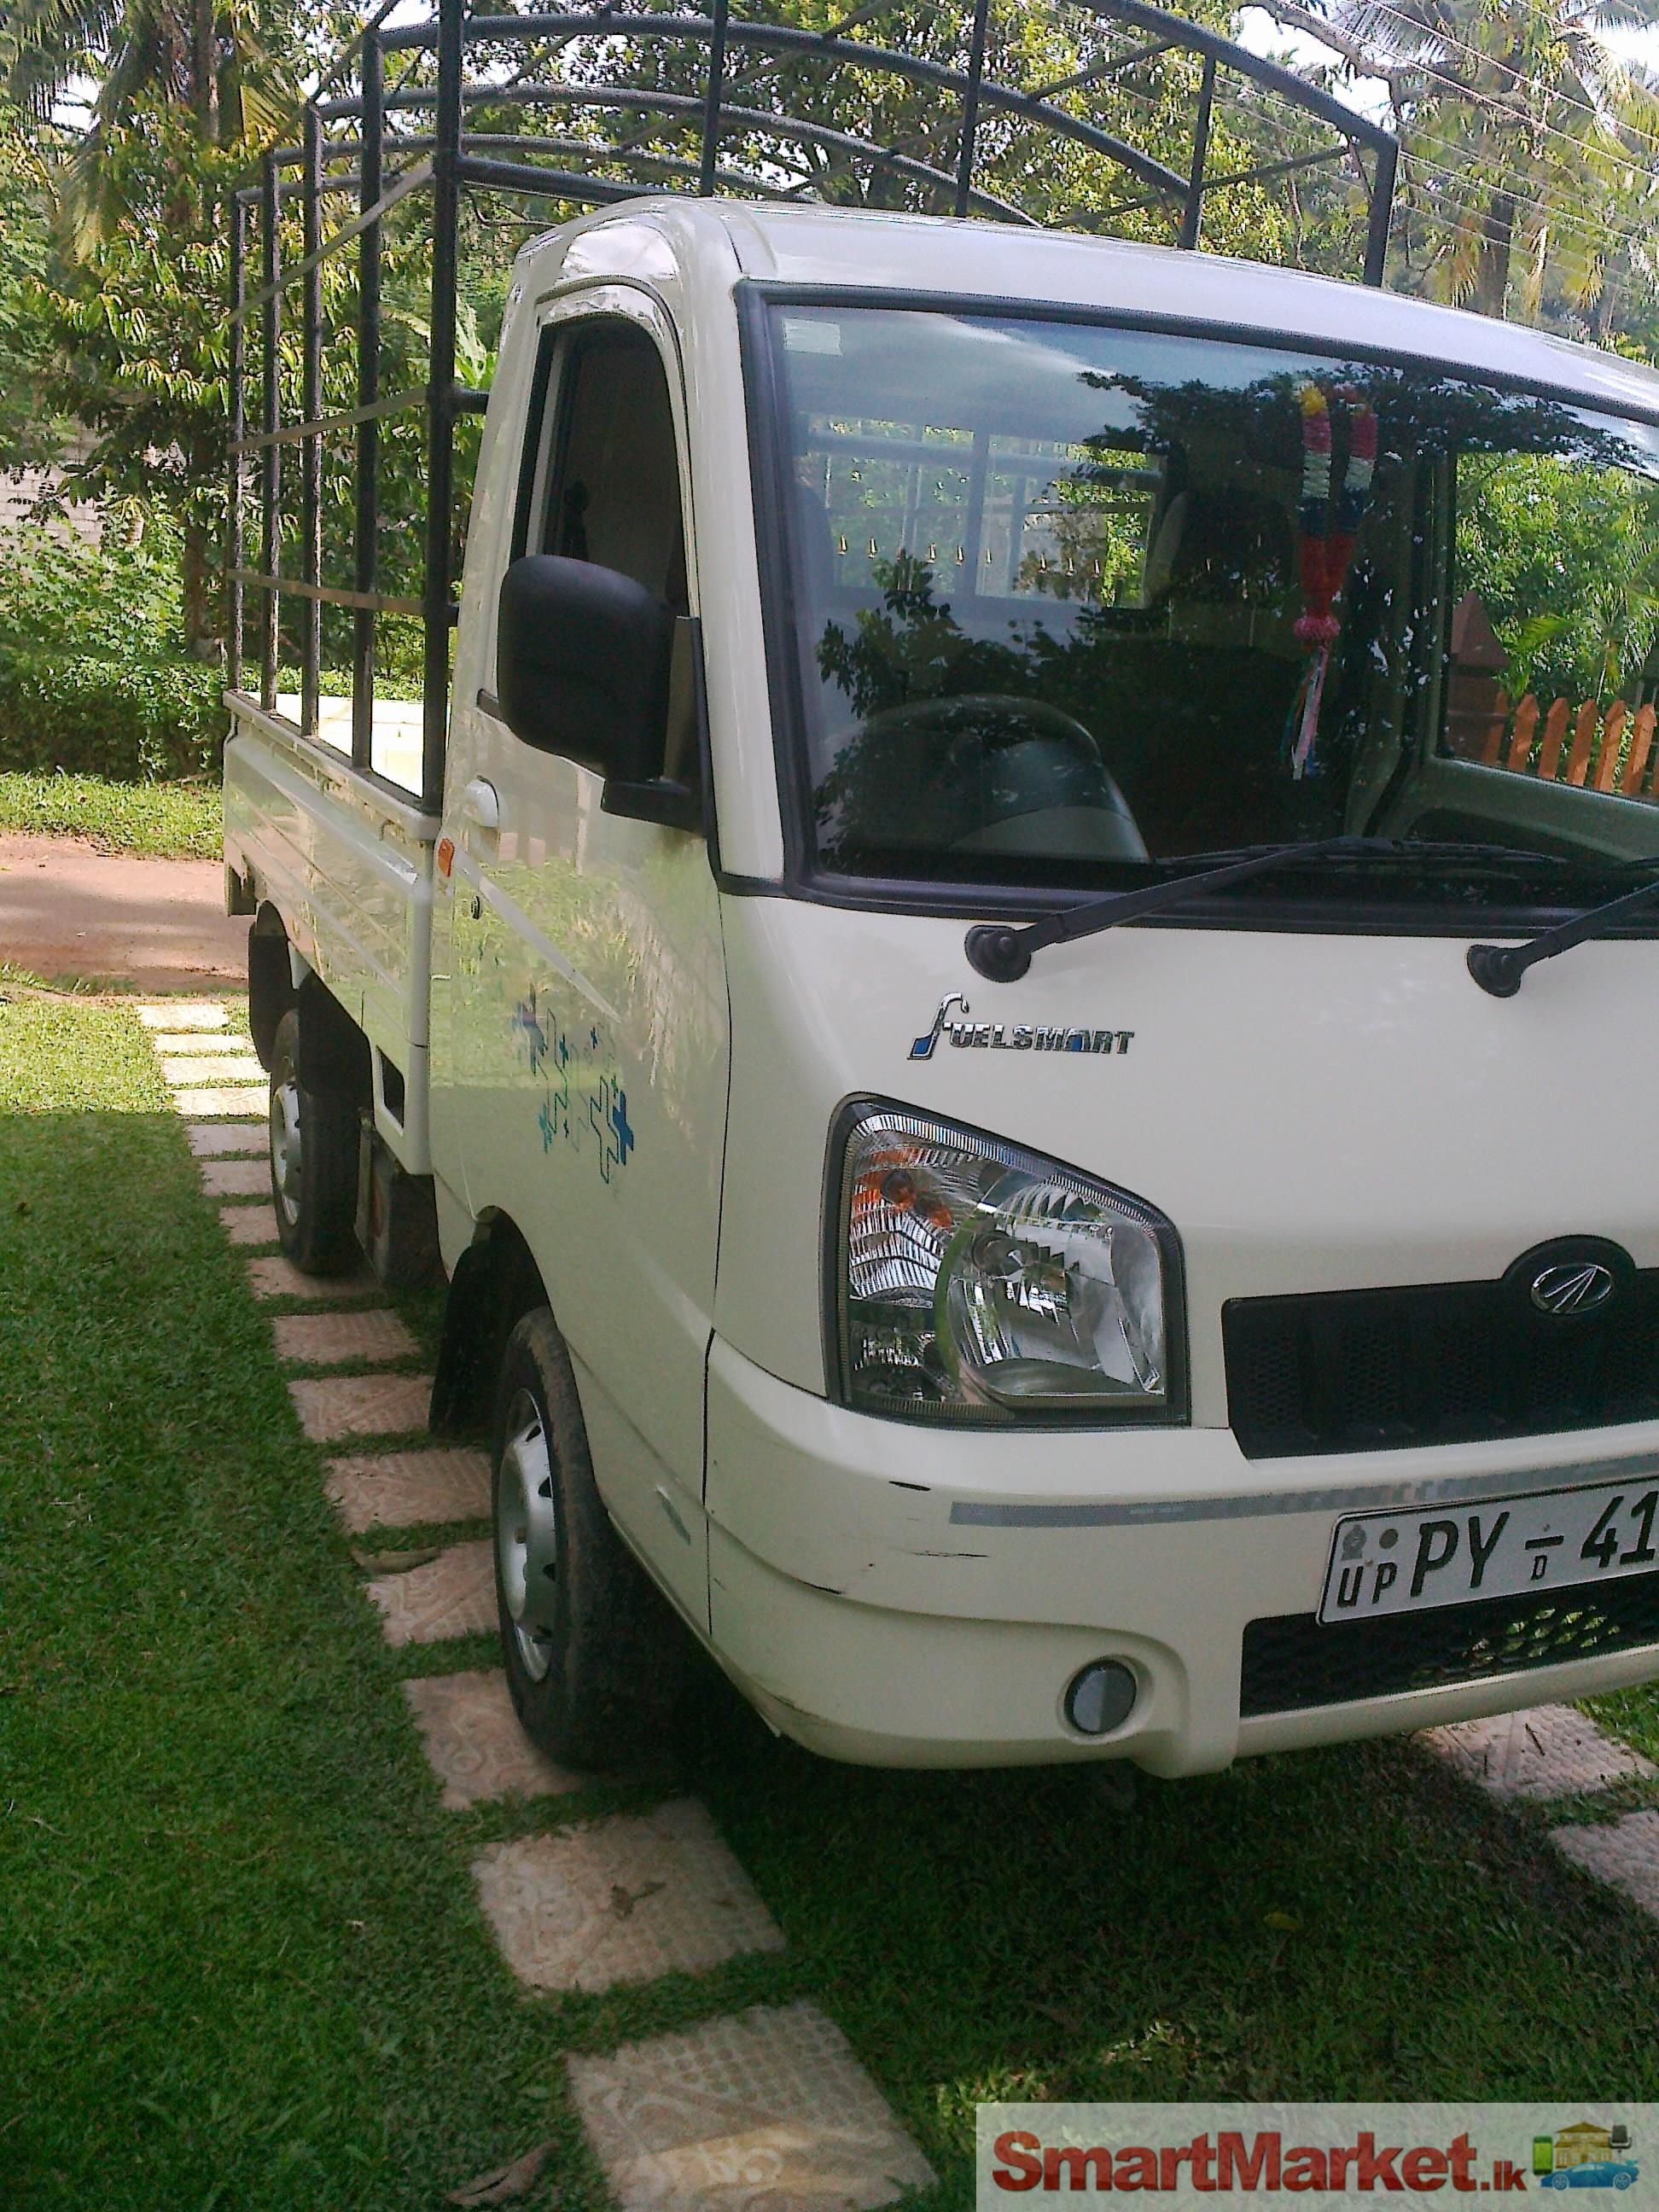 mahindra maxximo price in bangalore dating